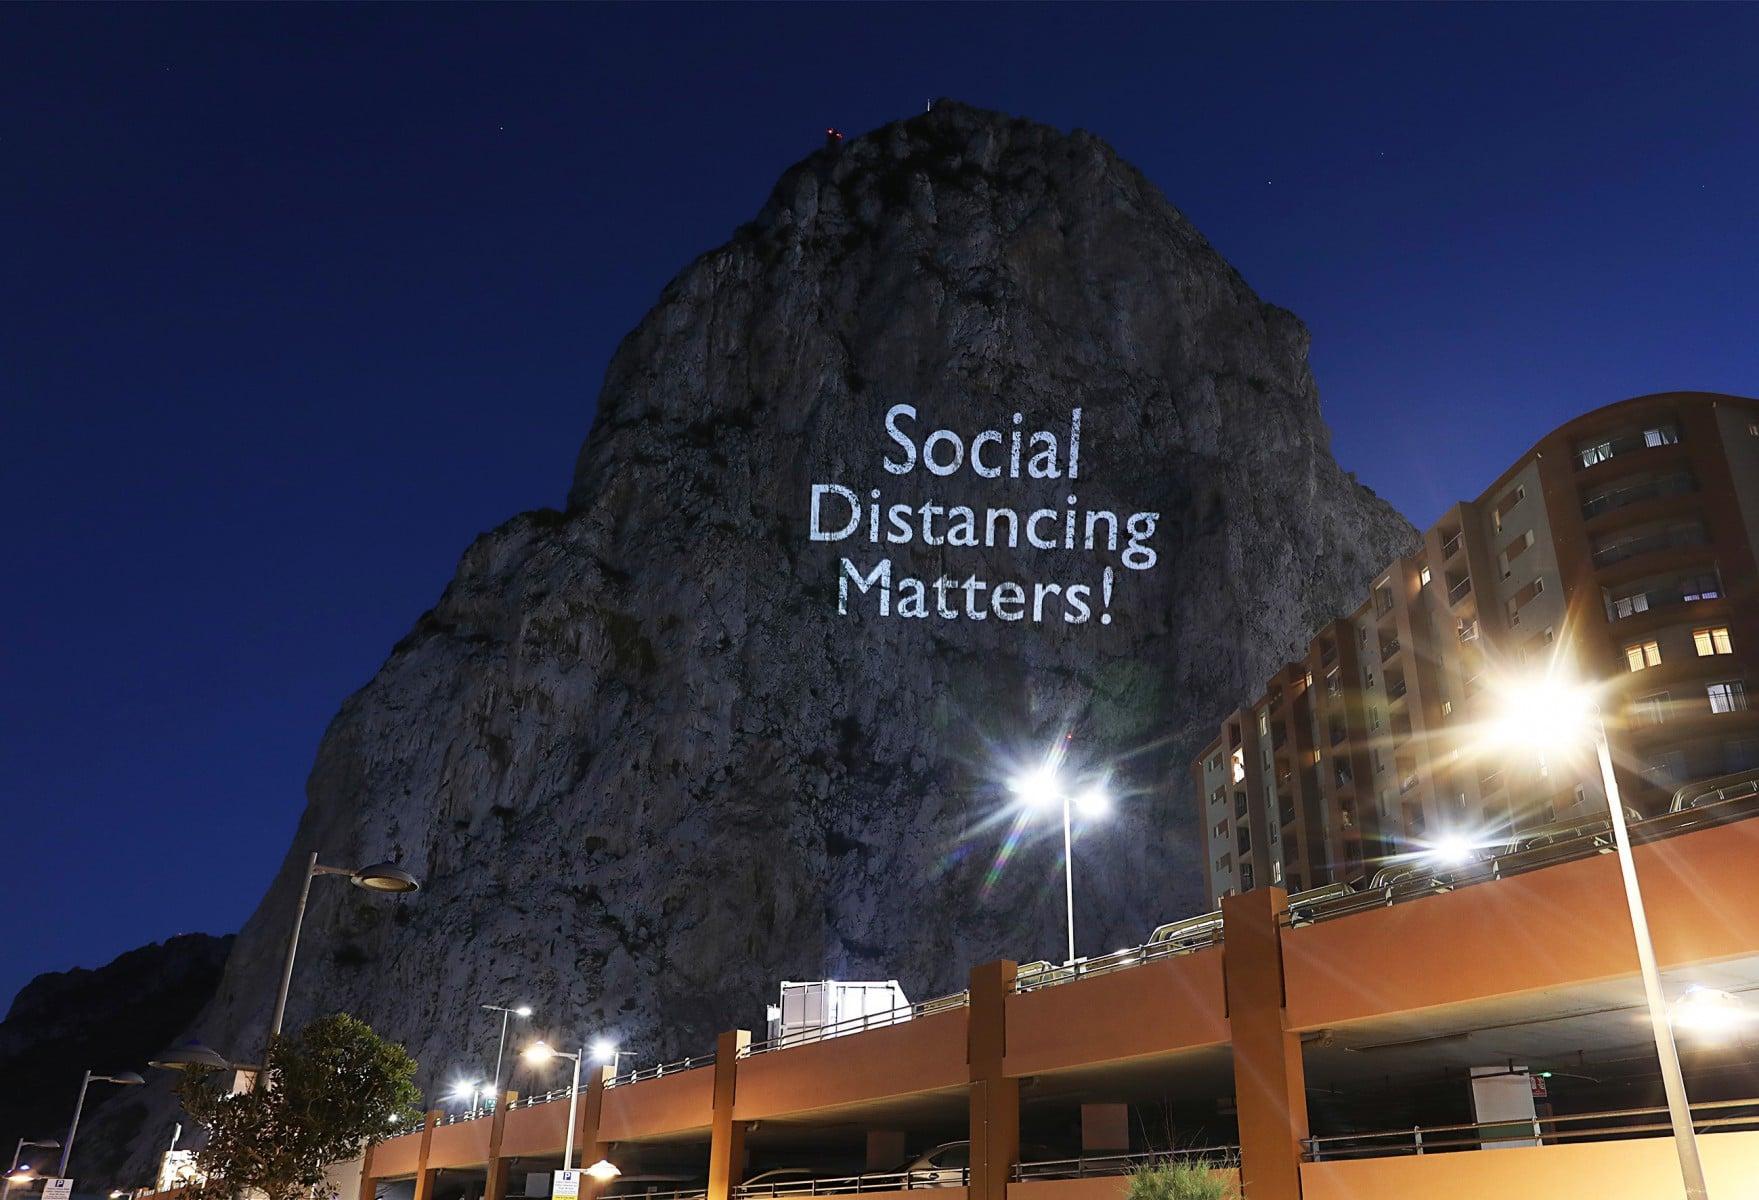 social-distancing-matters_49851277522_o